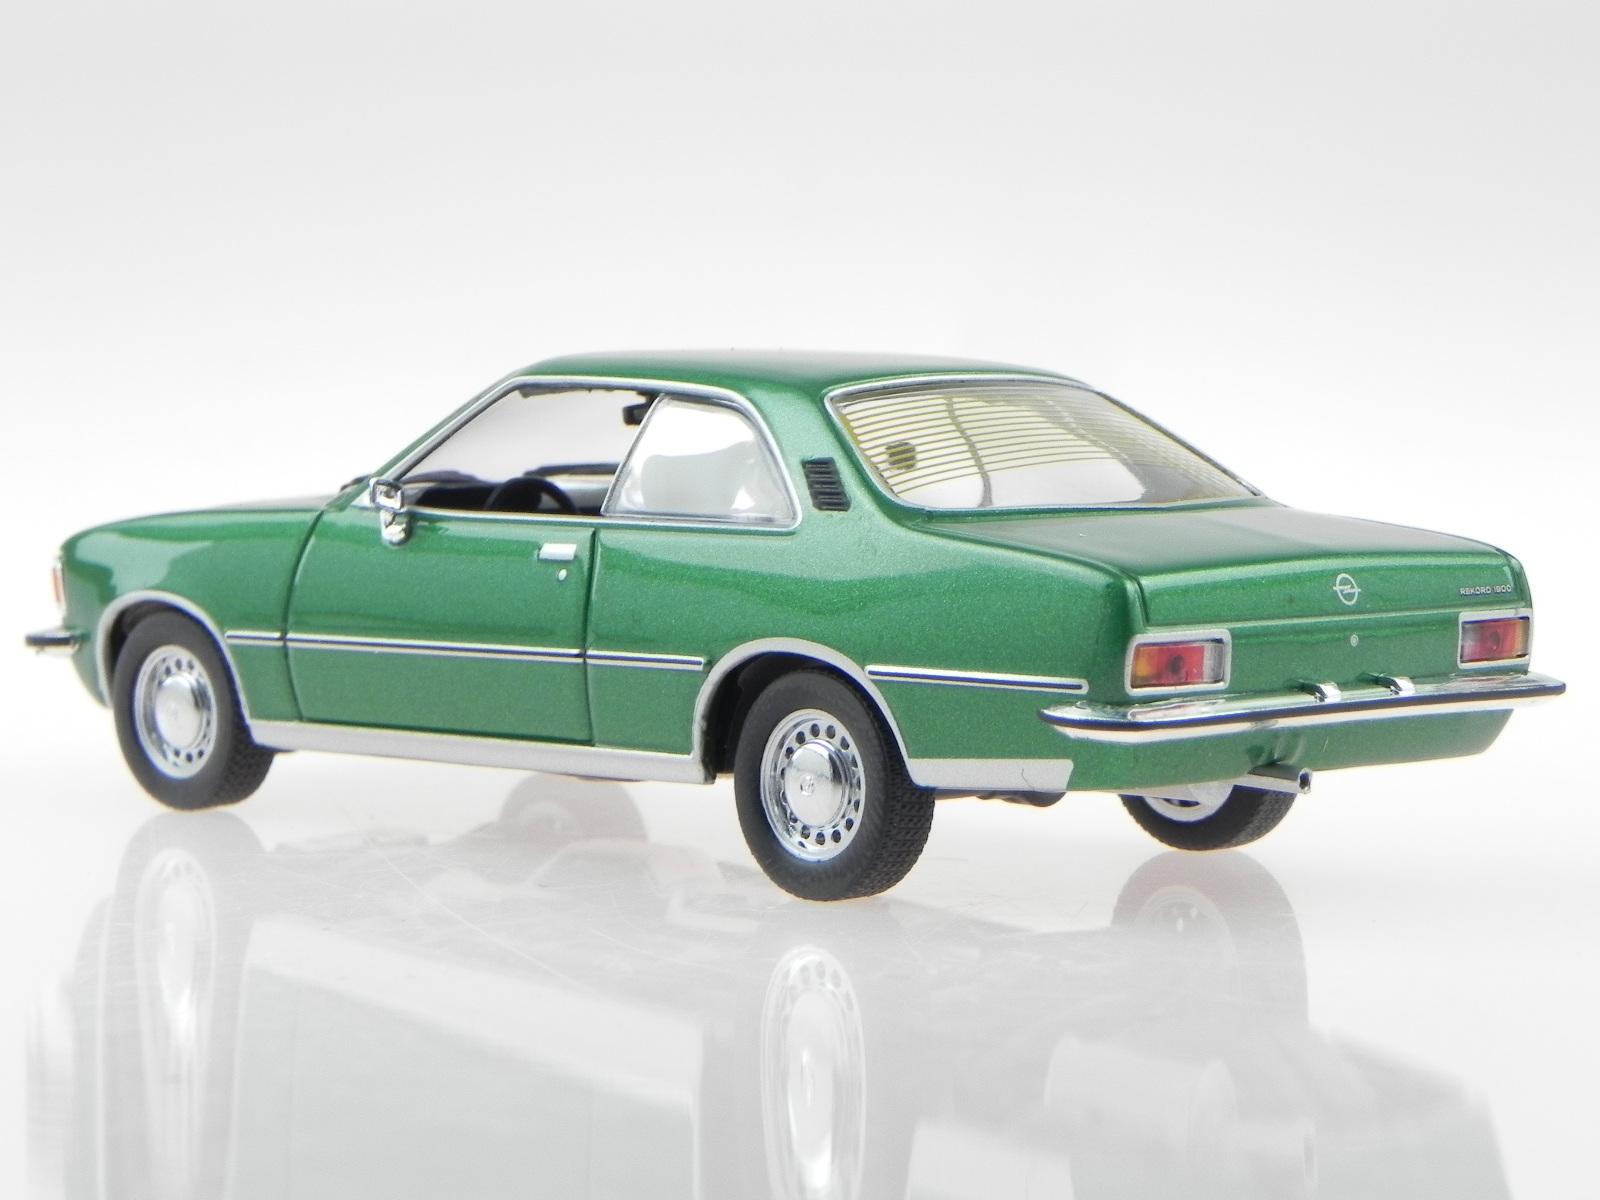 Opel-Rekord-D-cupe-verde-coche-en-miniatura-400044022-Minichamps-1-43 miniatura 3